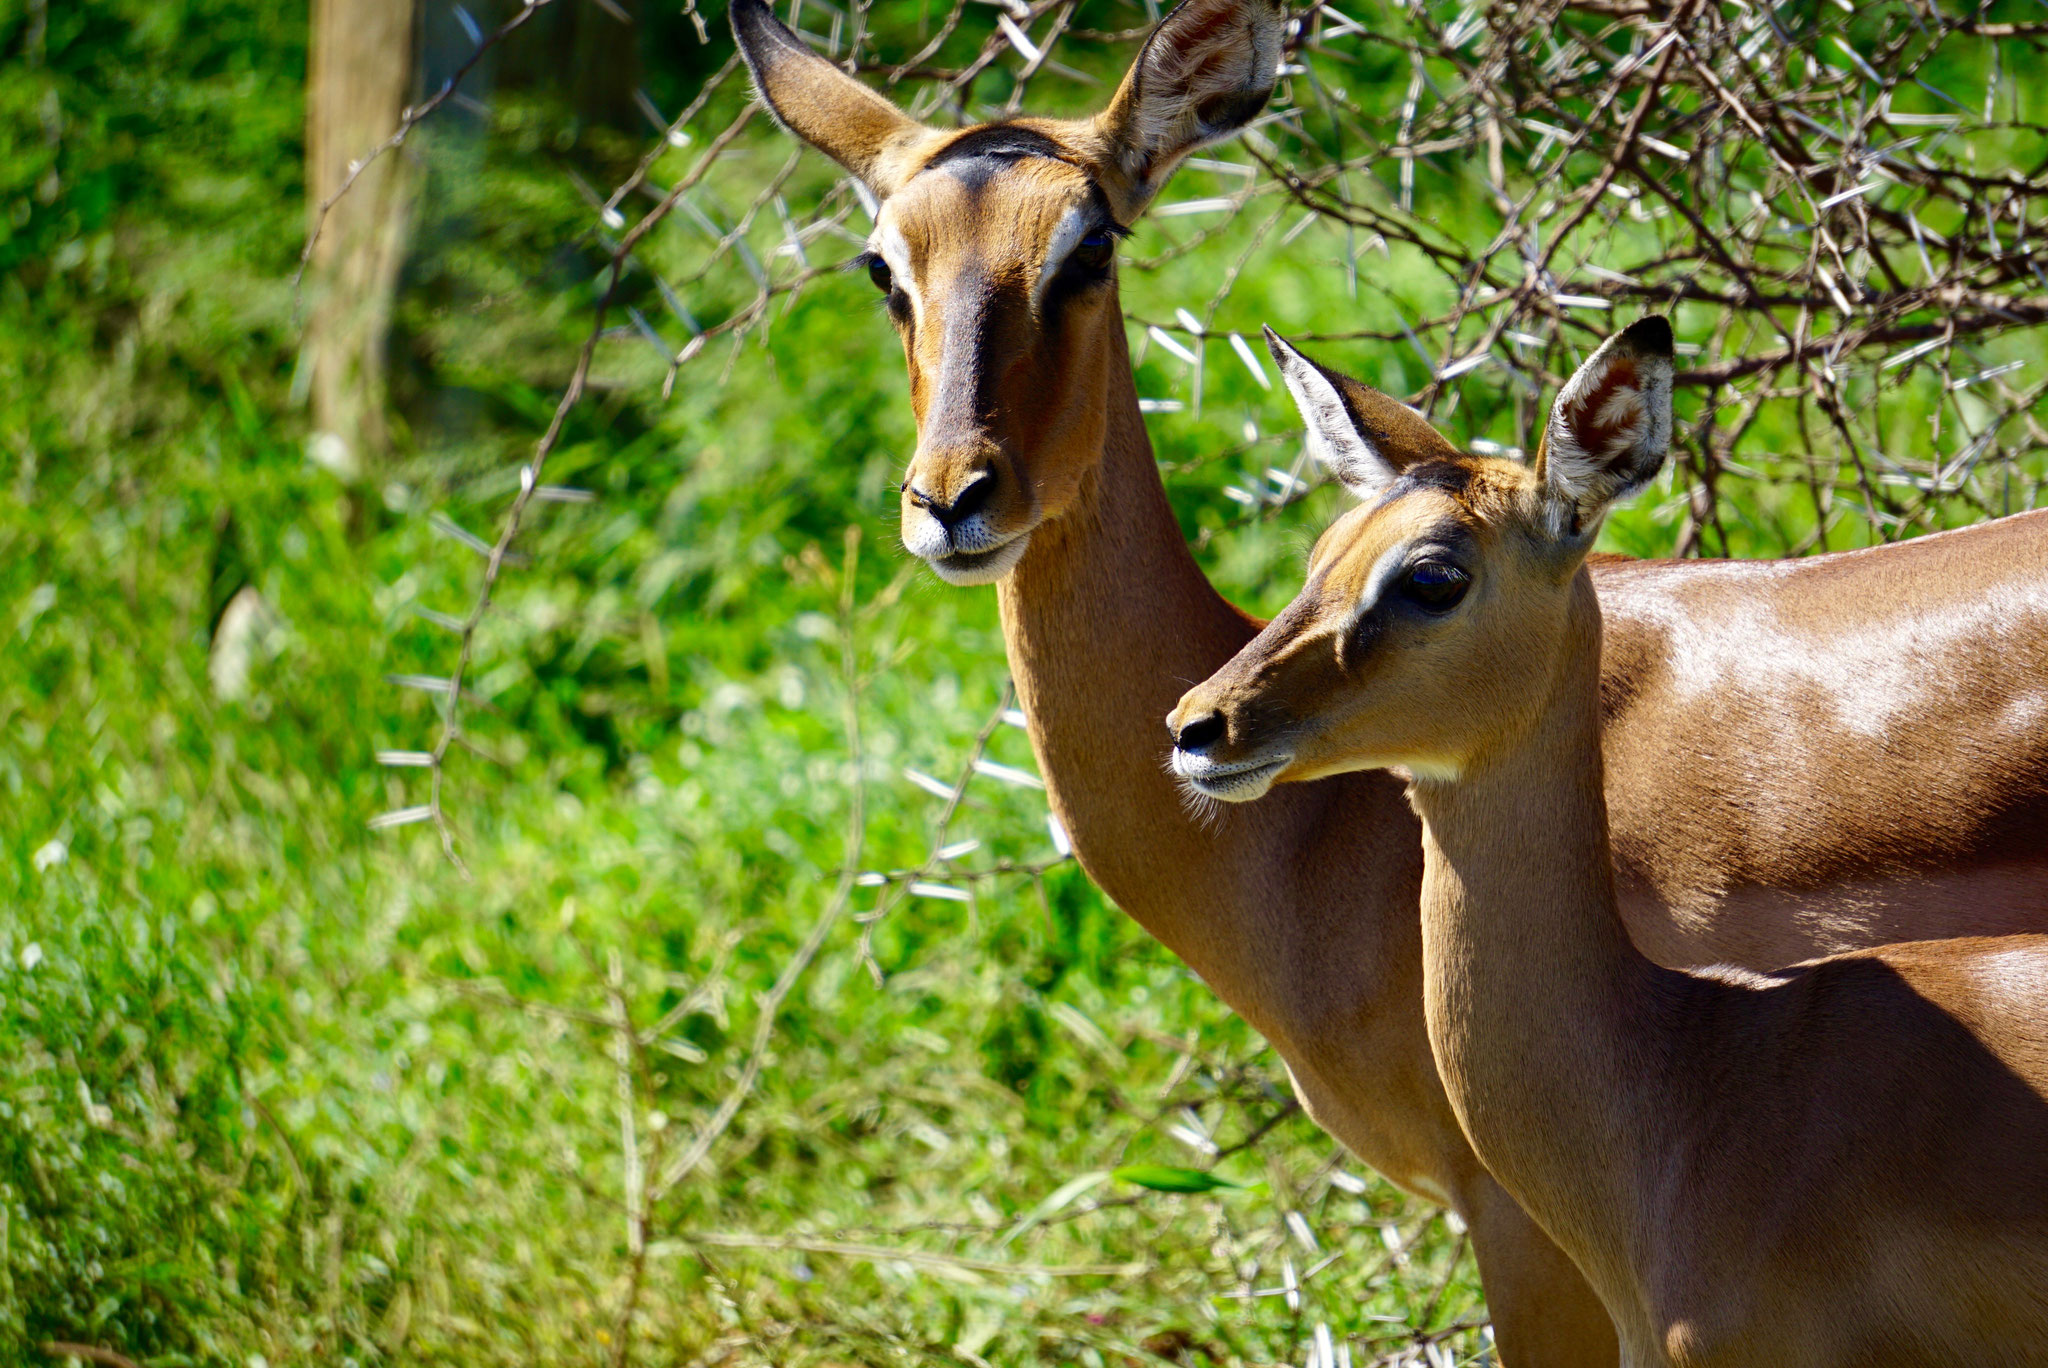 Bild: Impala